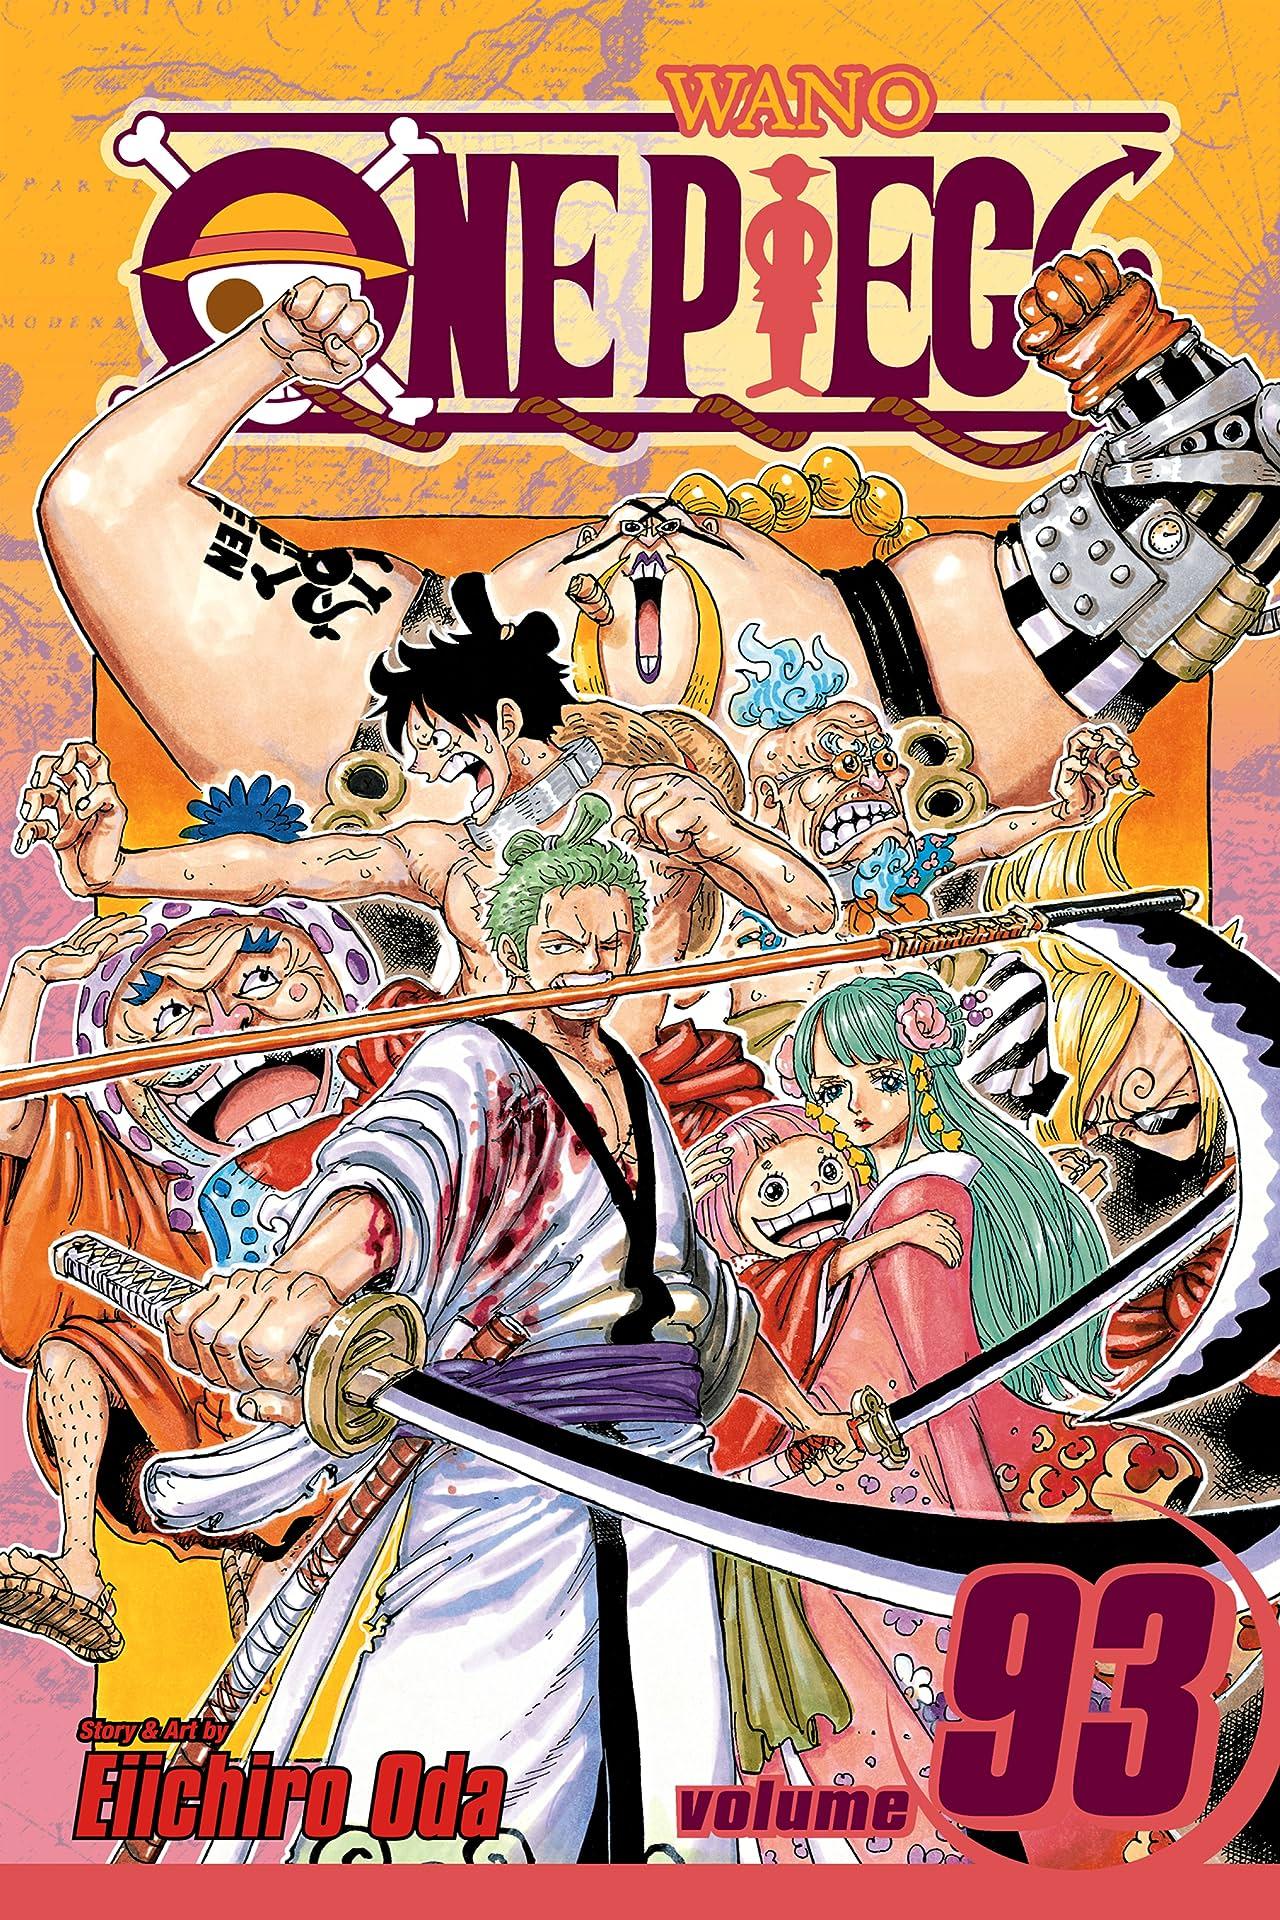 One Piece Vol. 93: The Star Of Ebisu